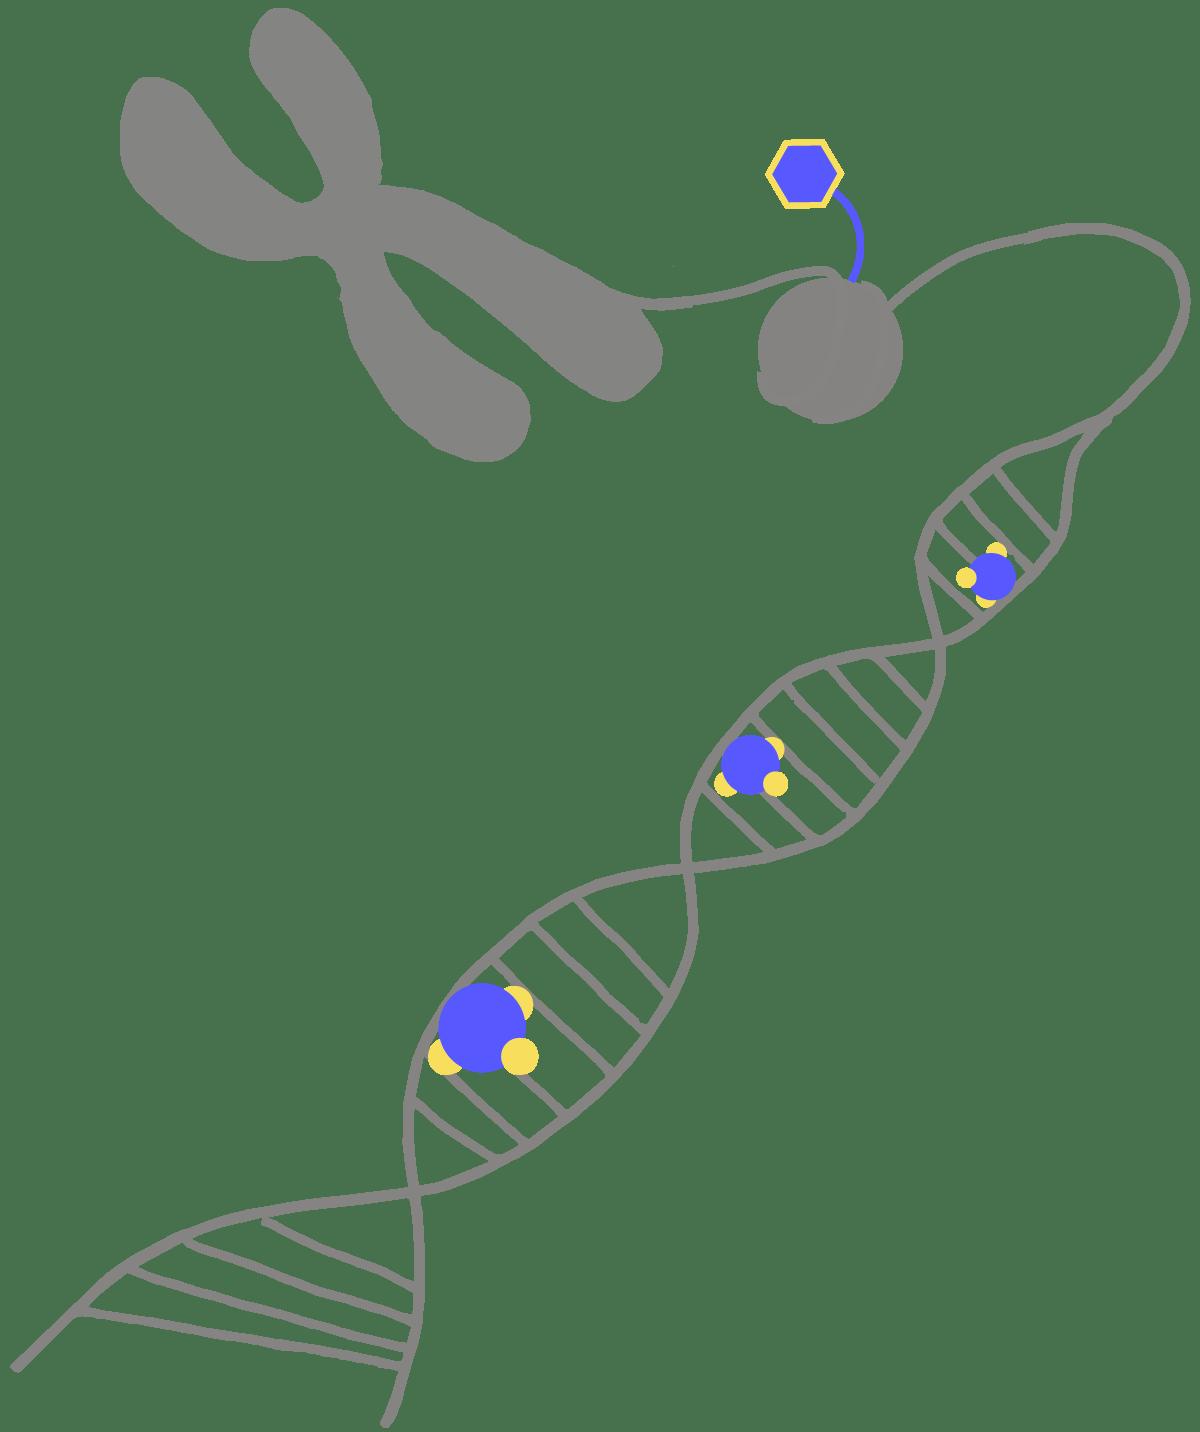 Dna clipart epigenetics. Glossary innovative genomics institute